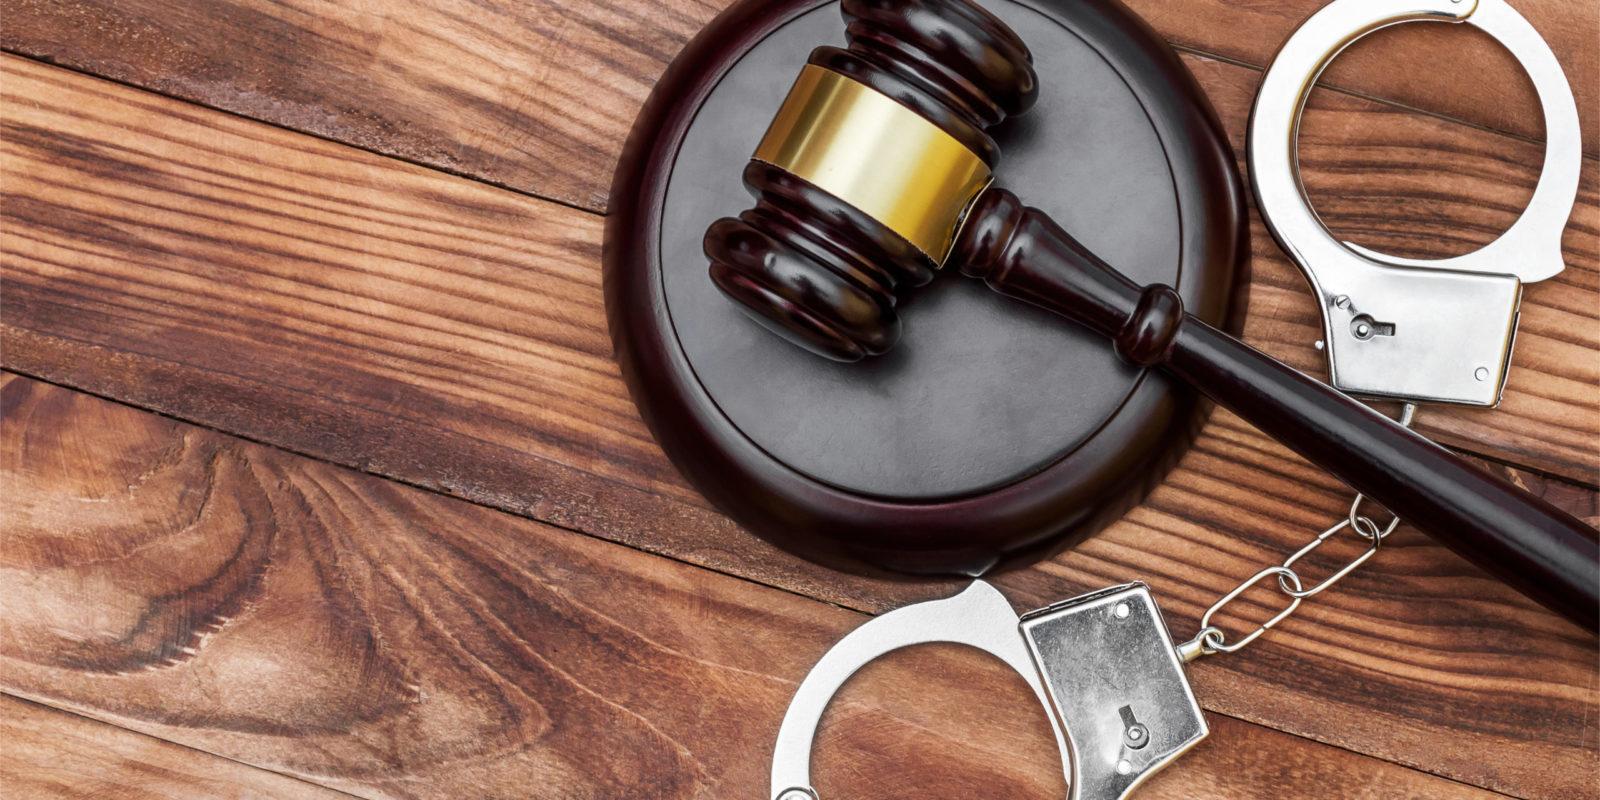 penalties for marijuana possession in virginia varies